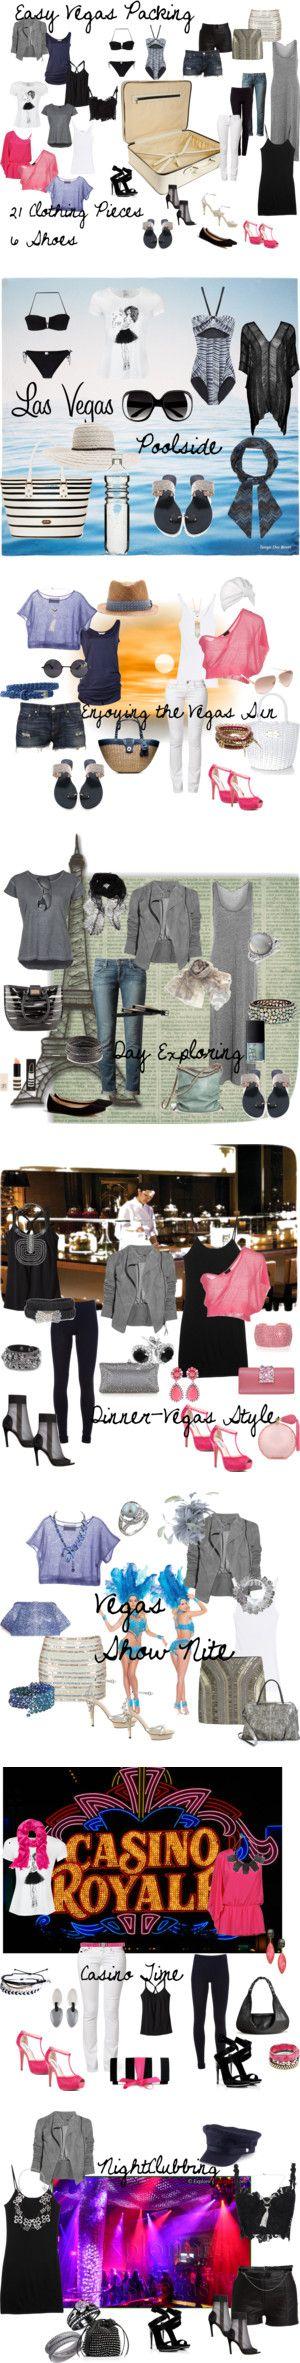 Vegas Packing by atraub-1 on Polyvore featuring Valextra, Paige Denim, Joseph, Replay, American Vintage, Lot78, Giuseppe Zanotti, Bardot, Zero + Maria Cornejo and rag & bone